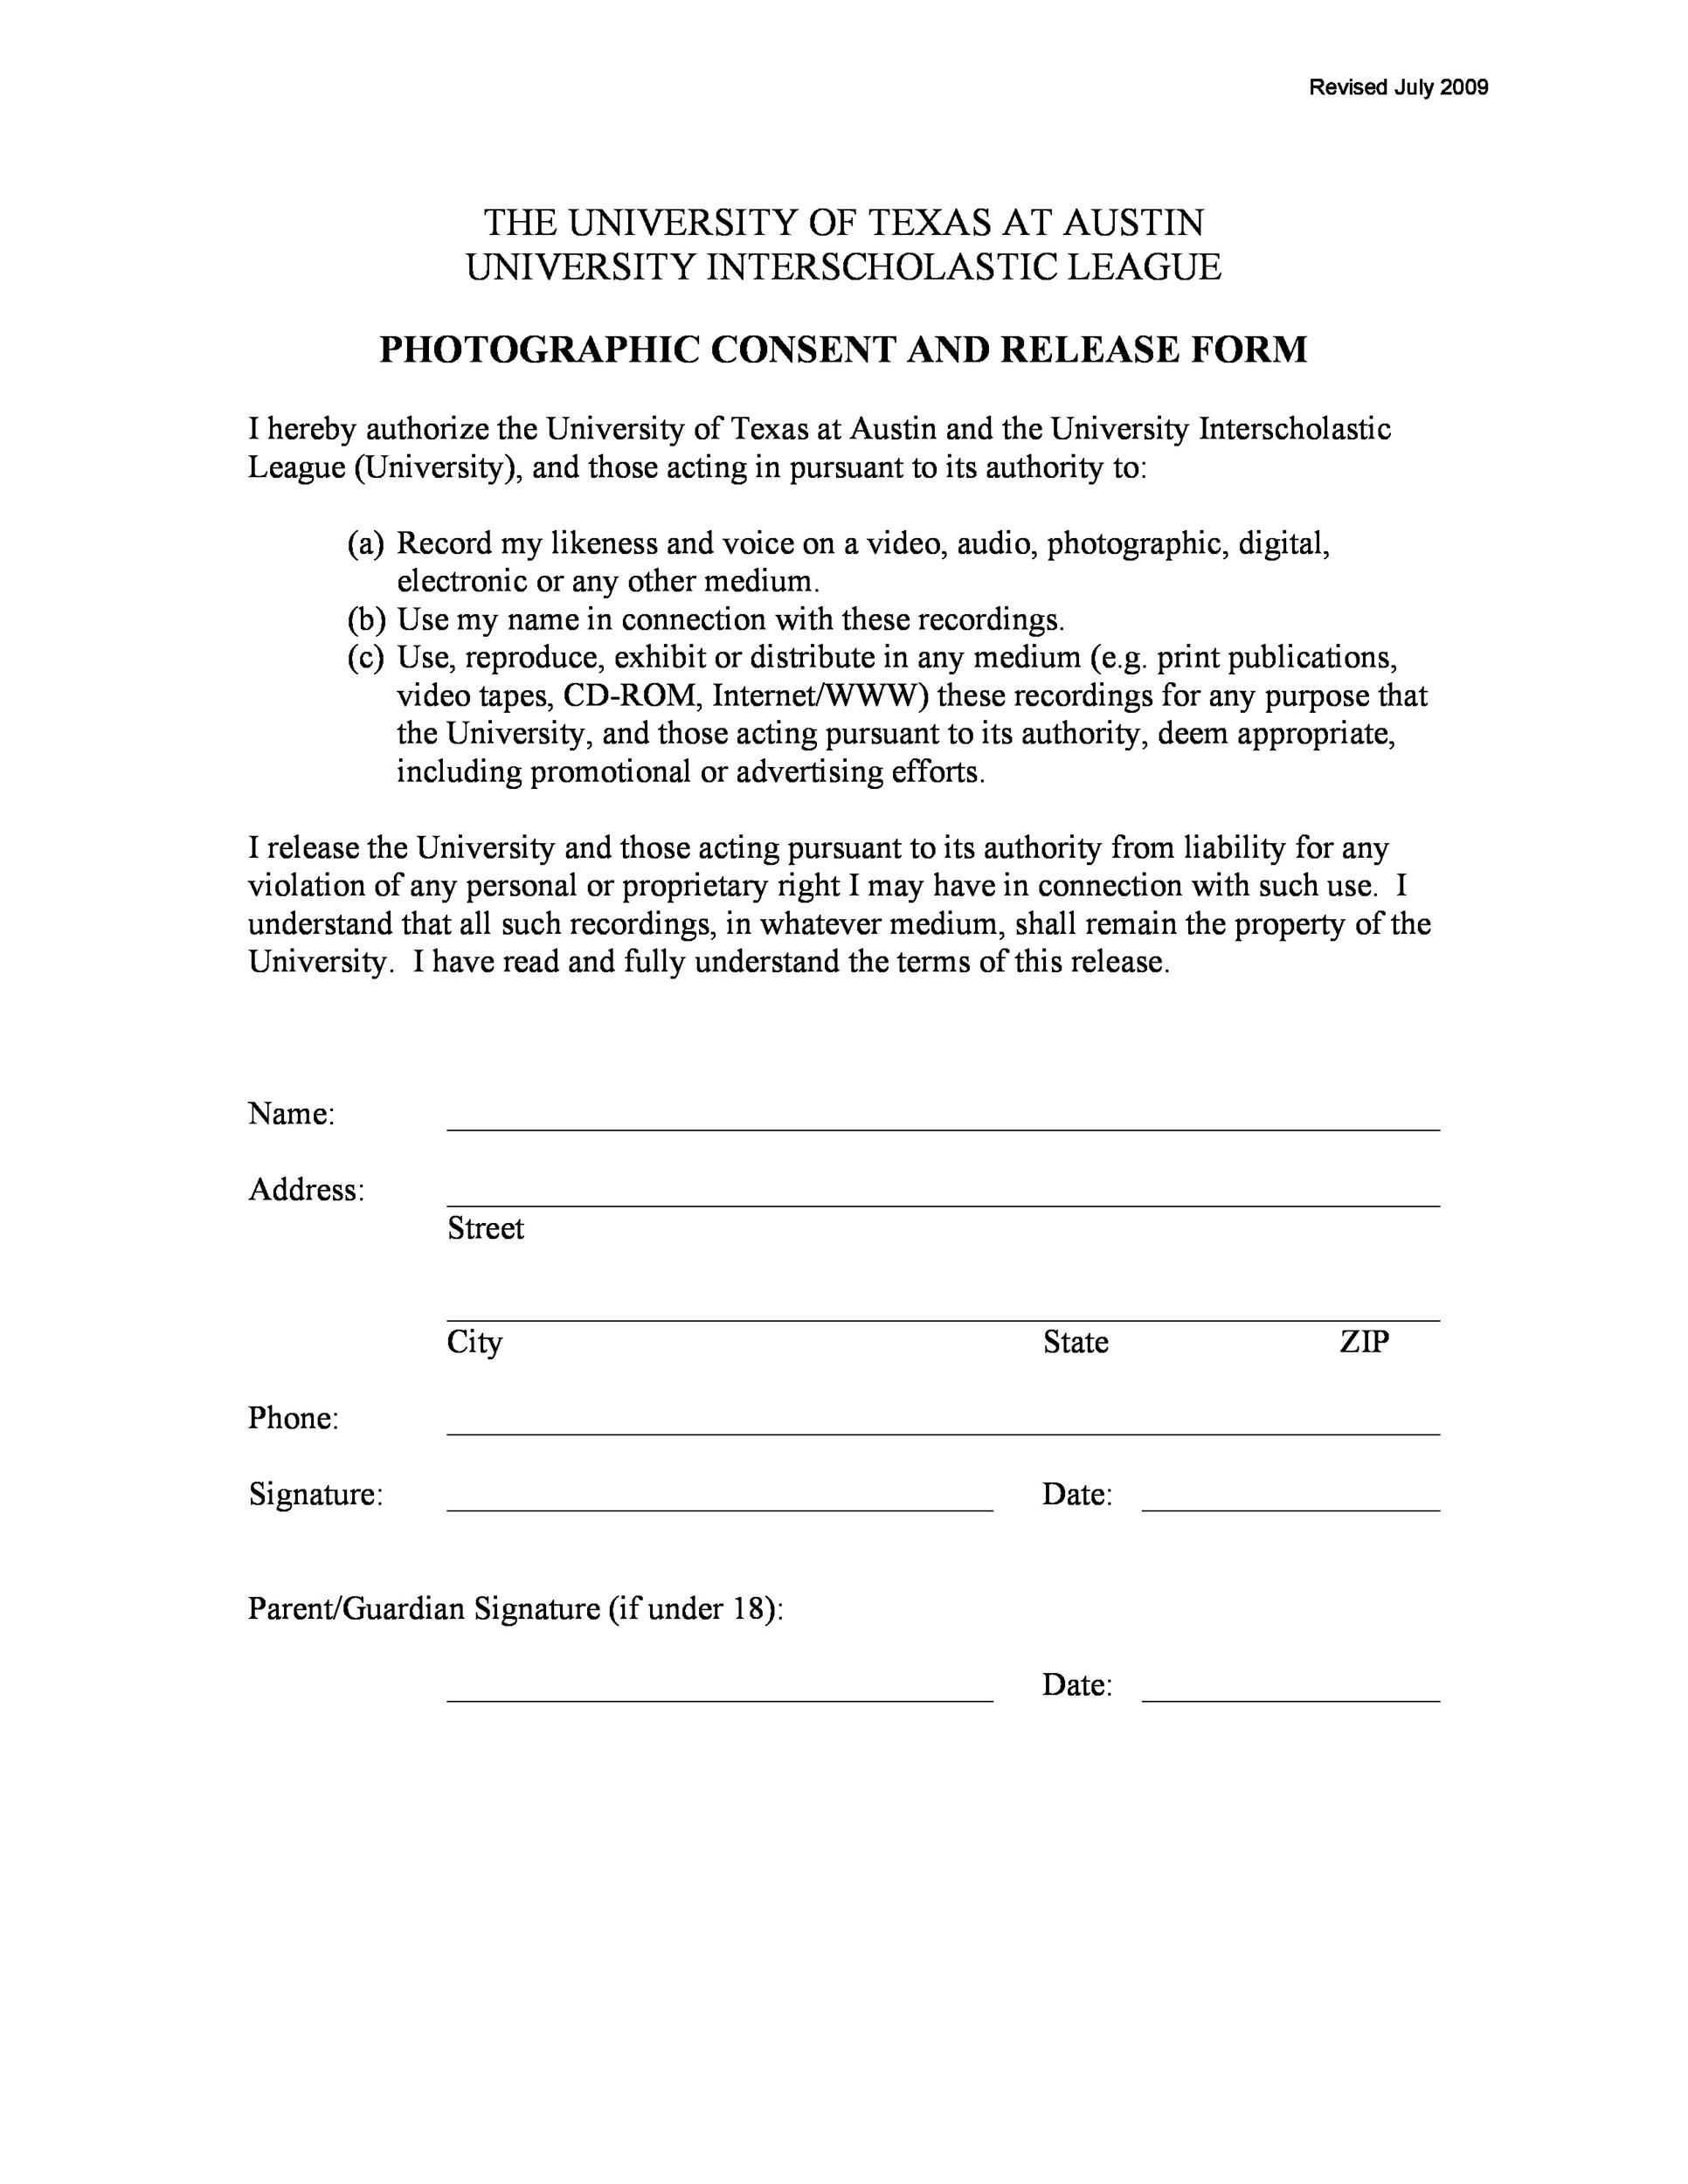 007 Singular Photo Release Form Template Idea  Video Consent Australia Free AndFull